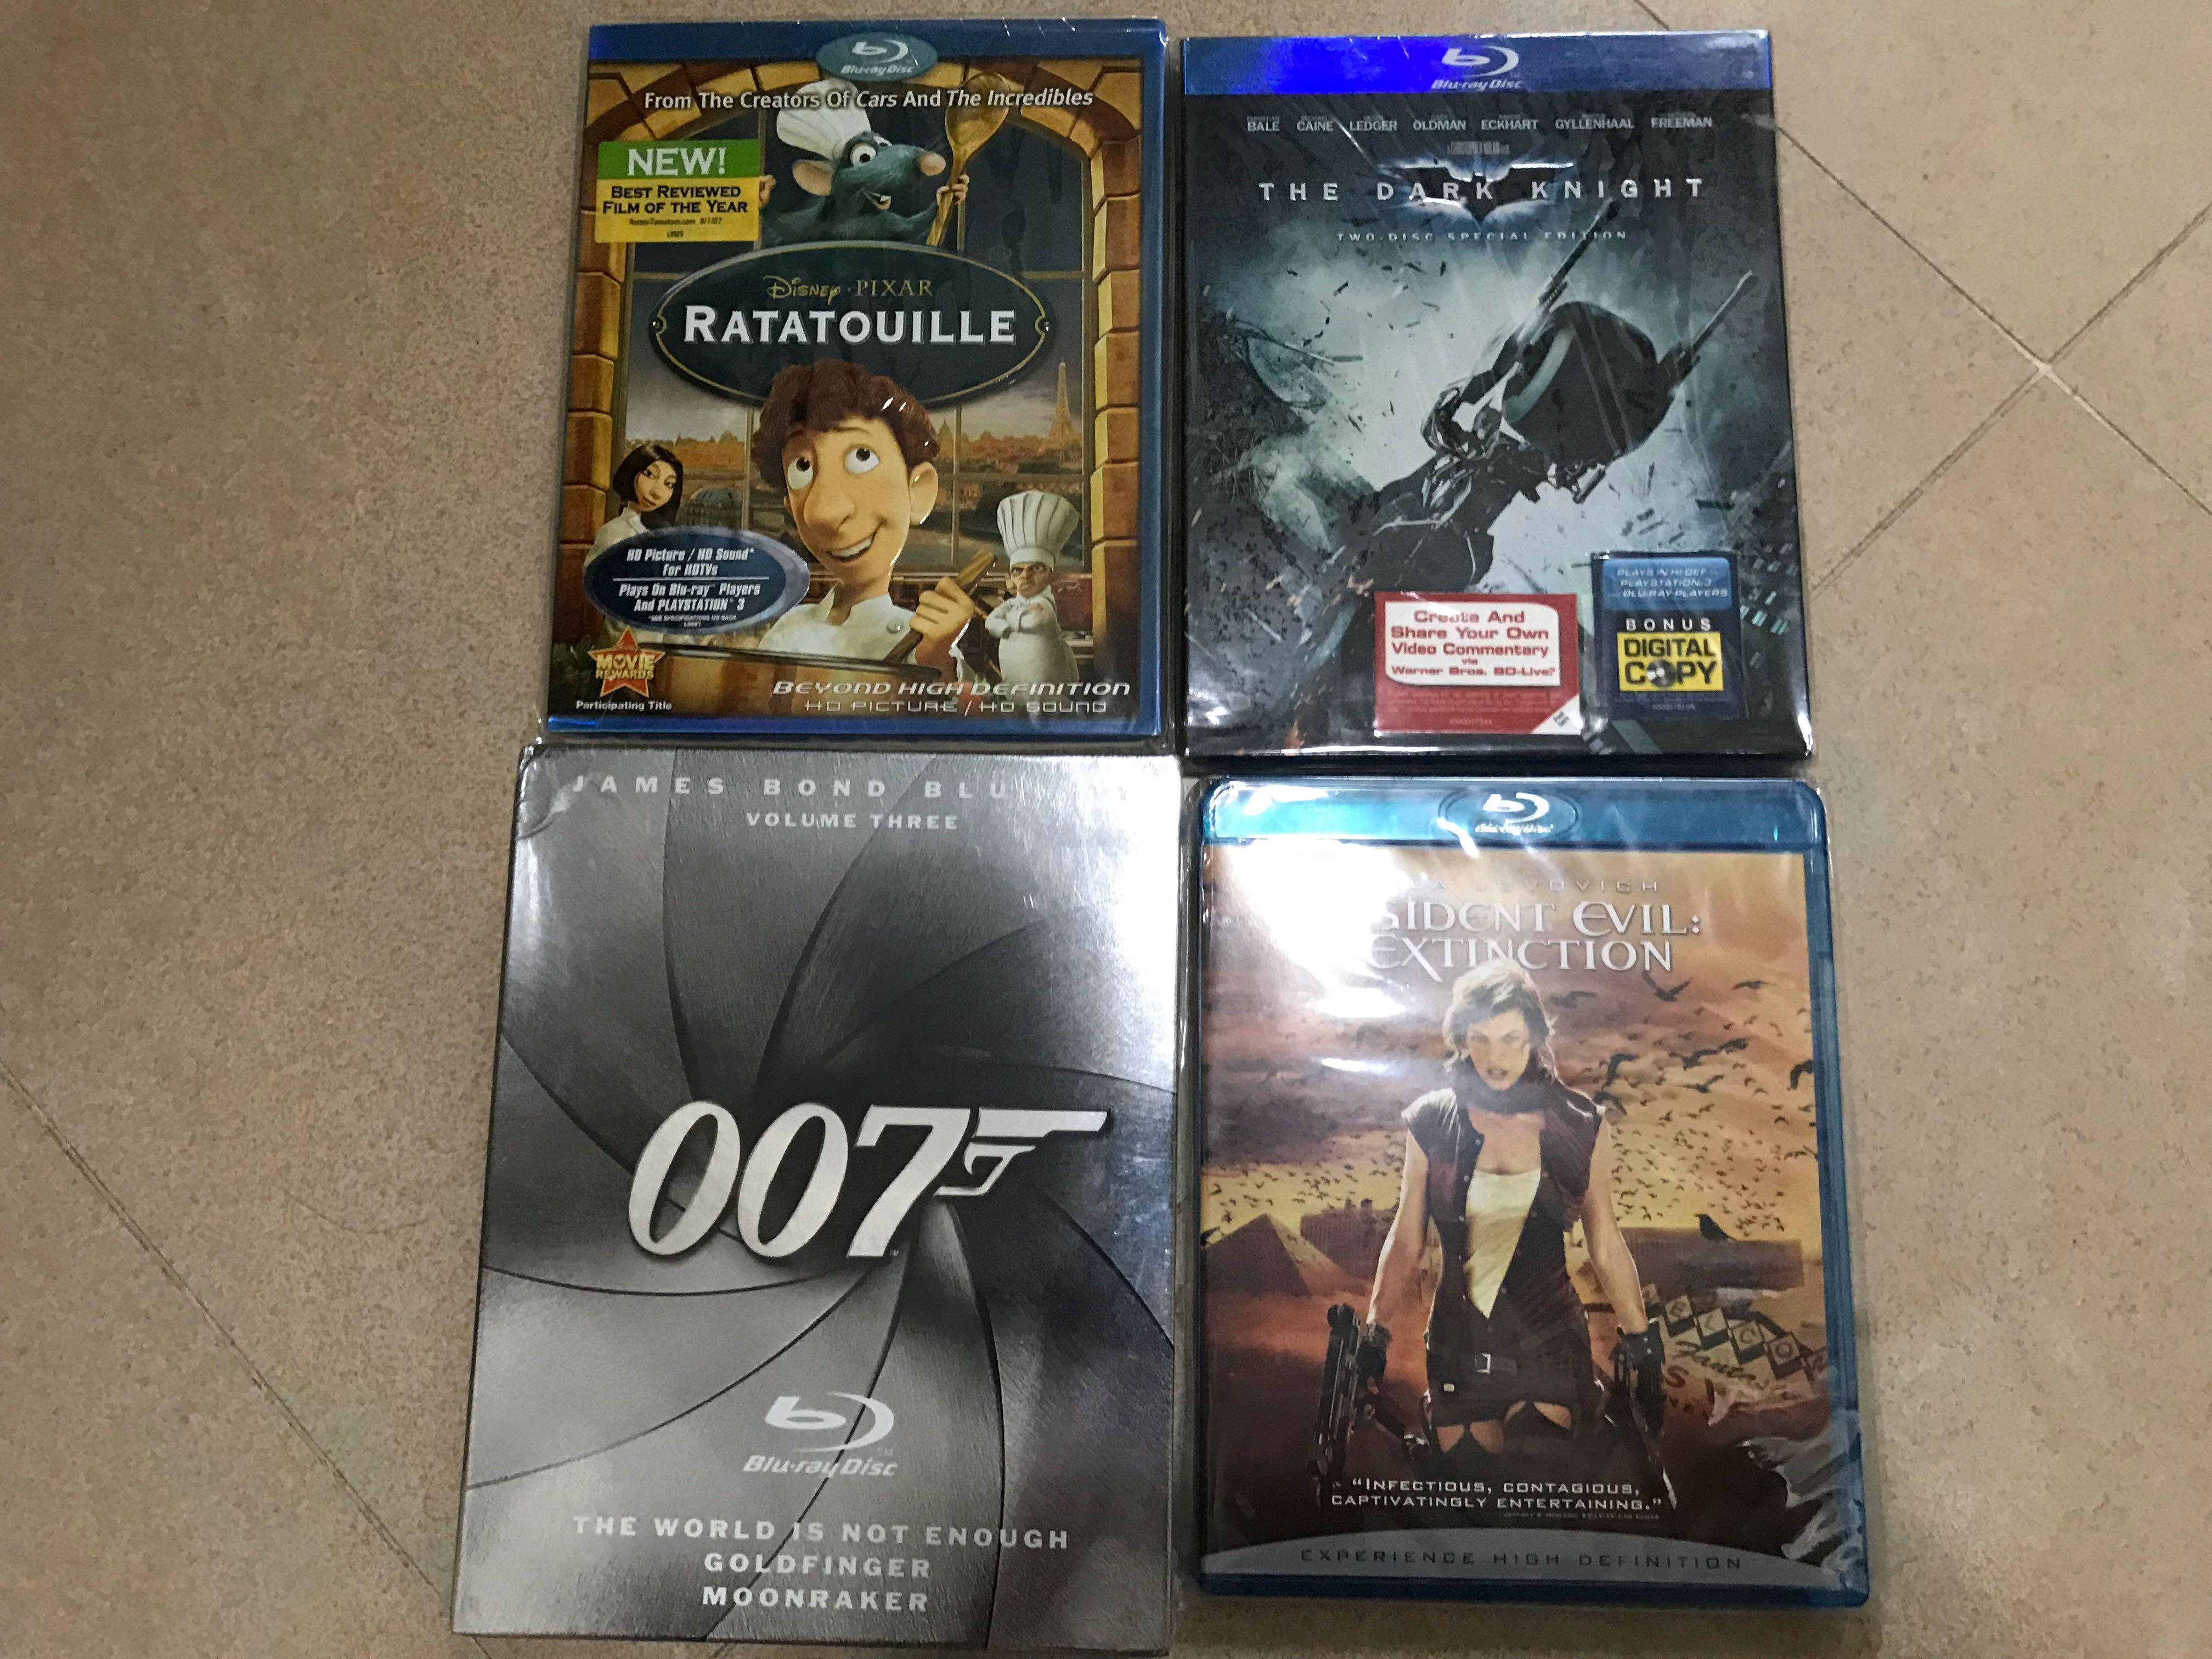 Blu ray movies $50 each; 007 $150